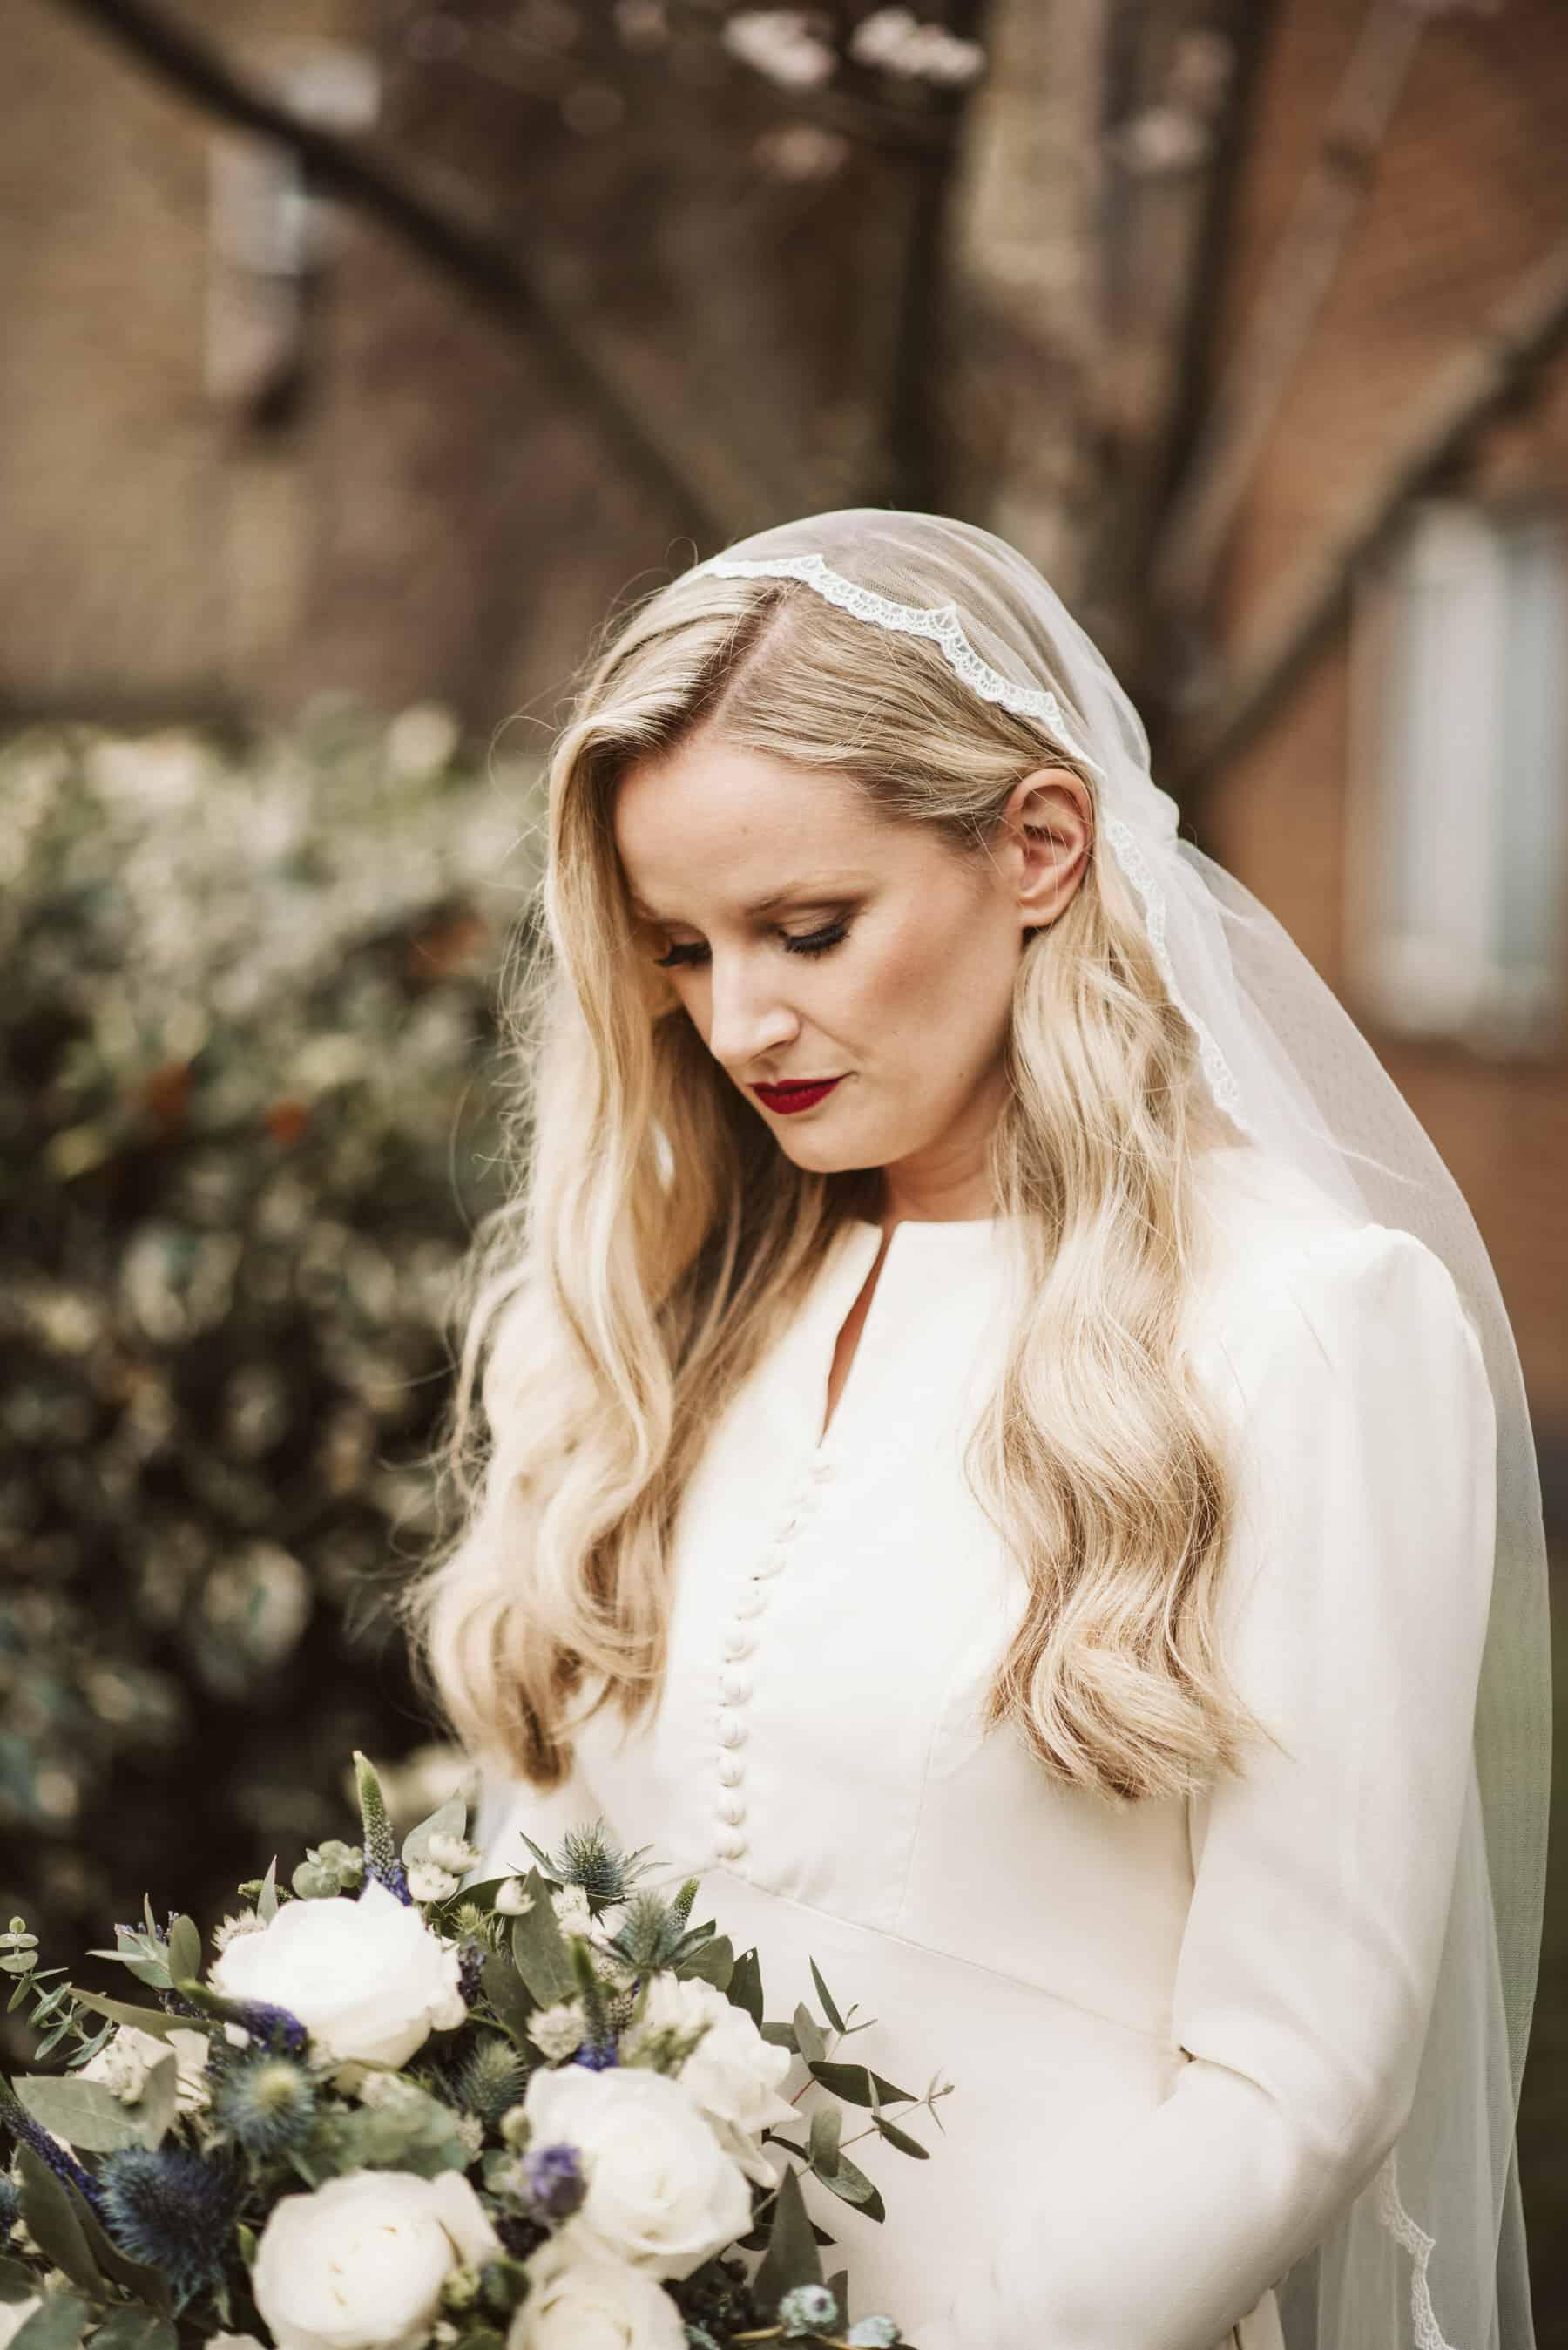 Stoke Newington Wedding photography